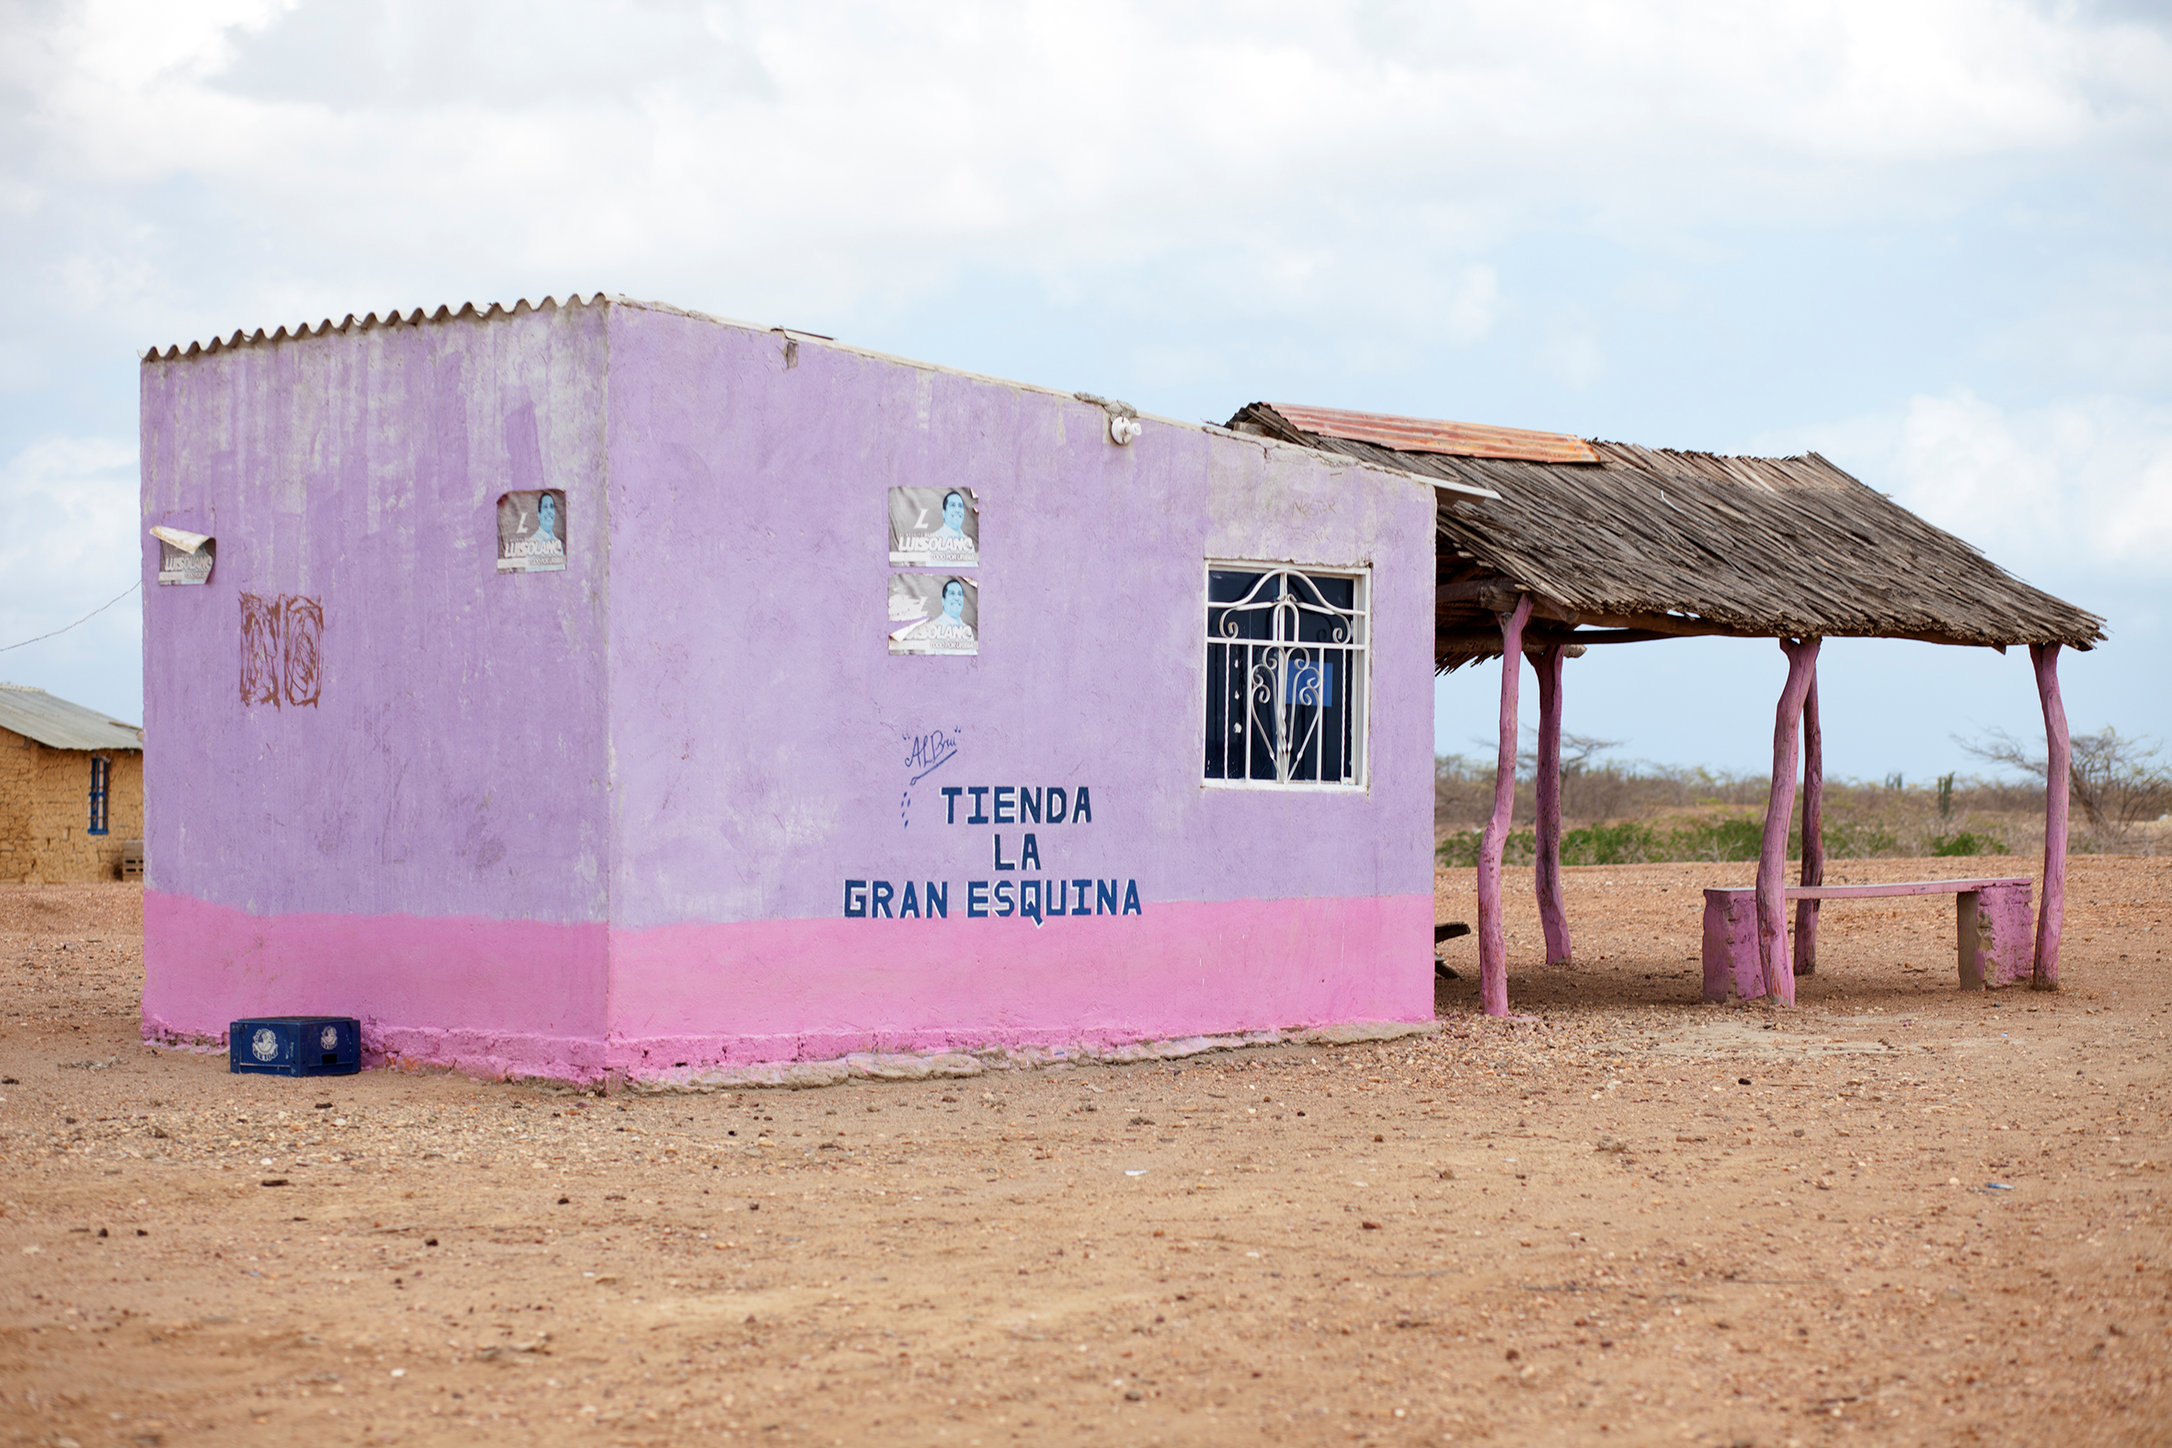 Guajira desert, Colombia, 2015